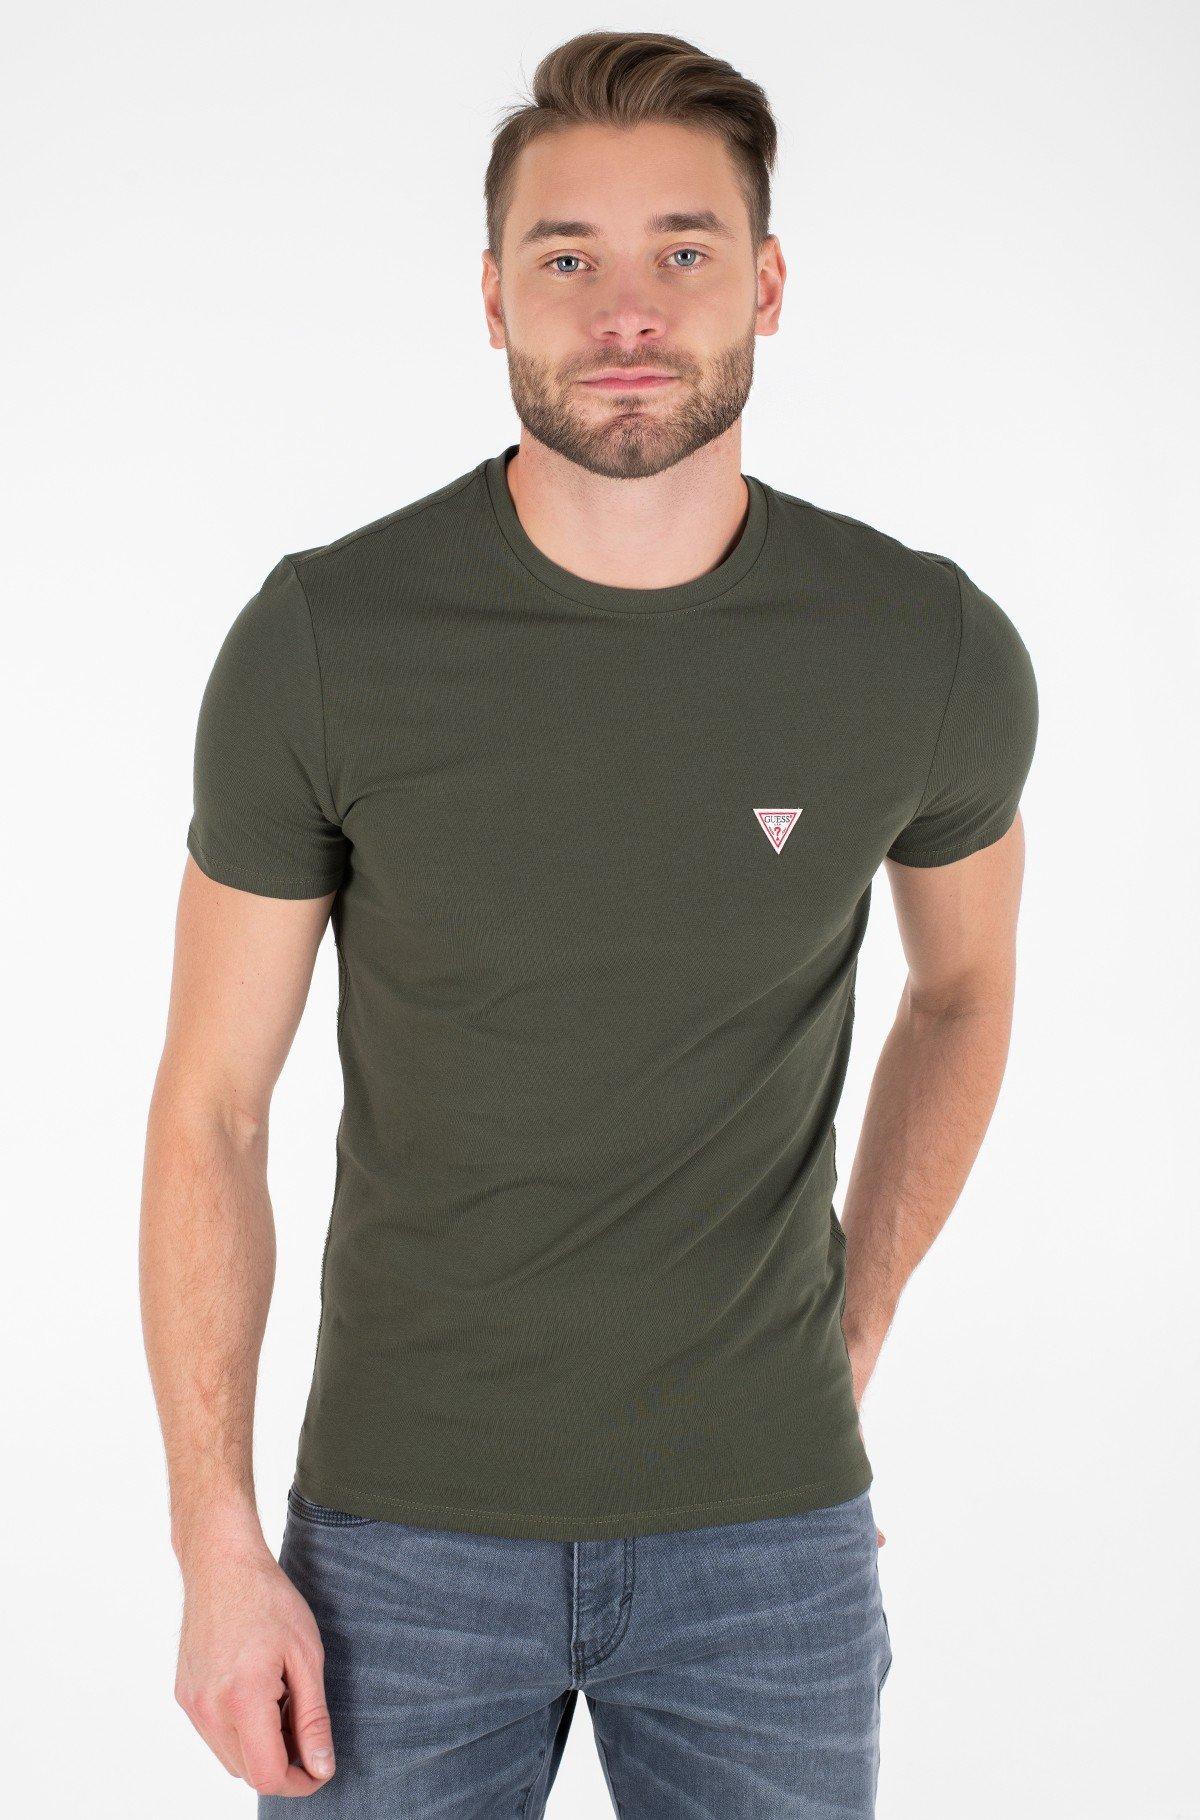 T-shirt M1RI24 J1311-full-1